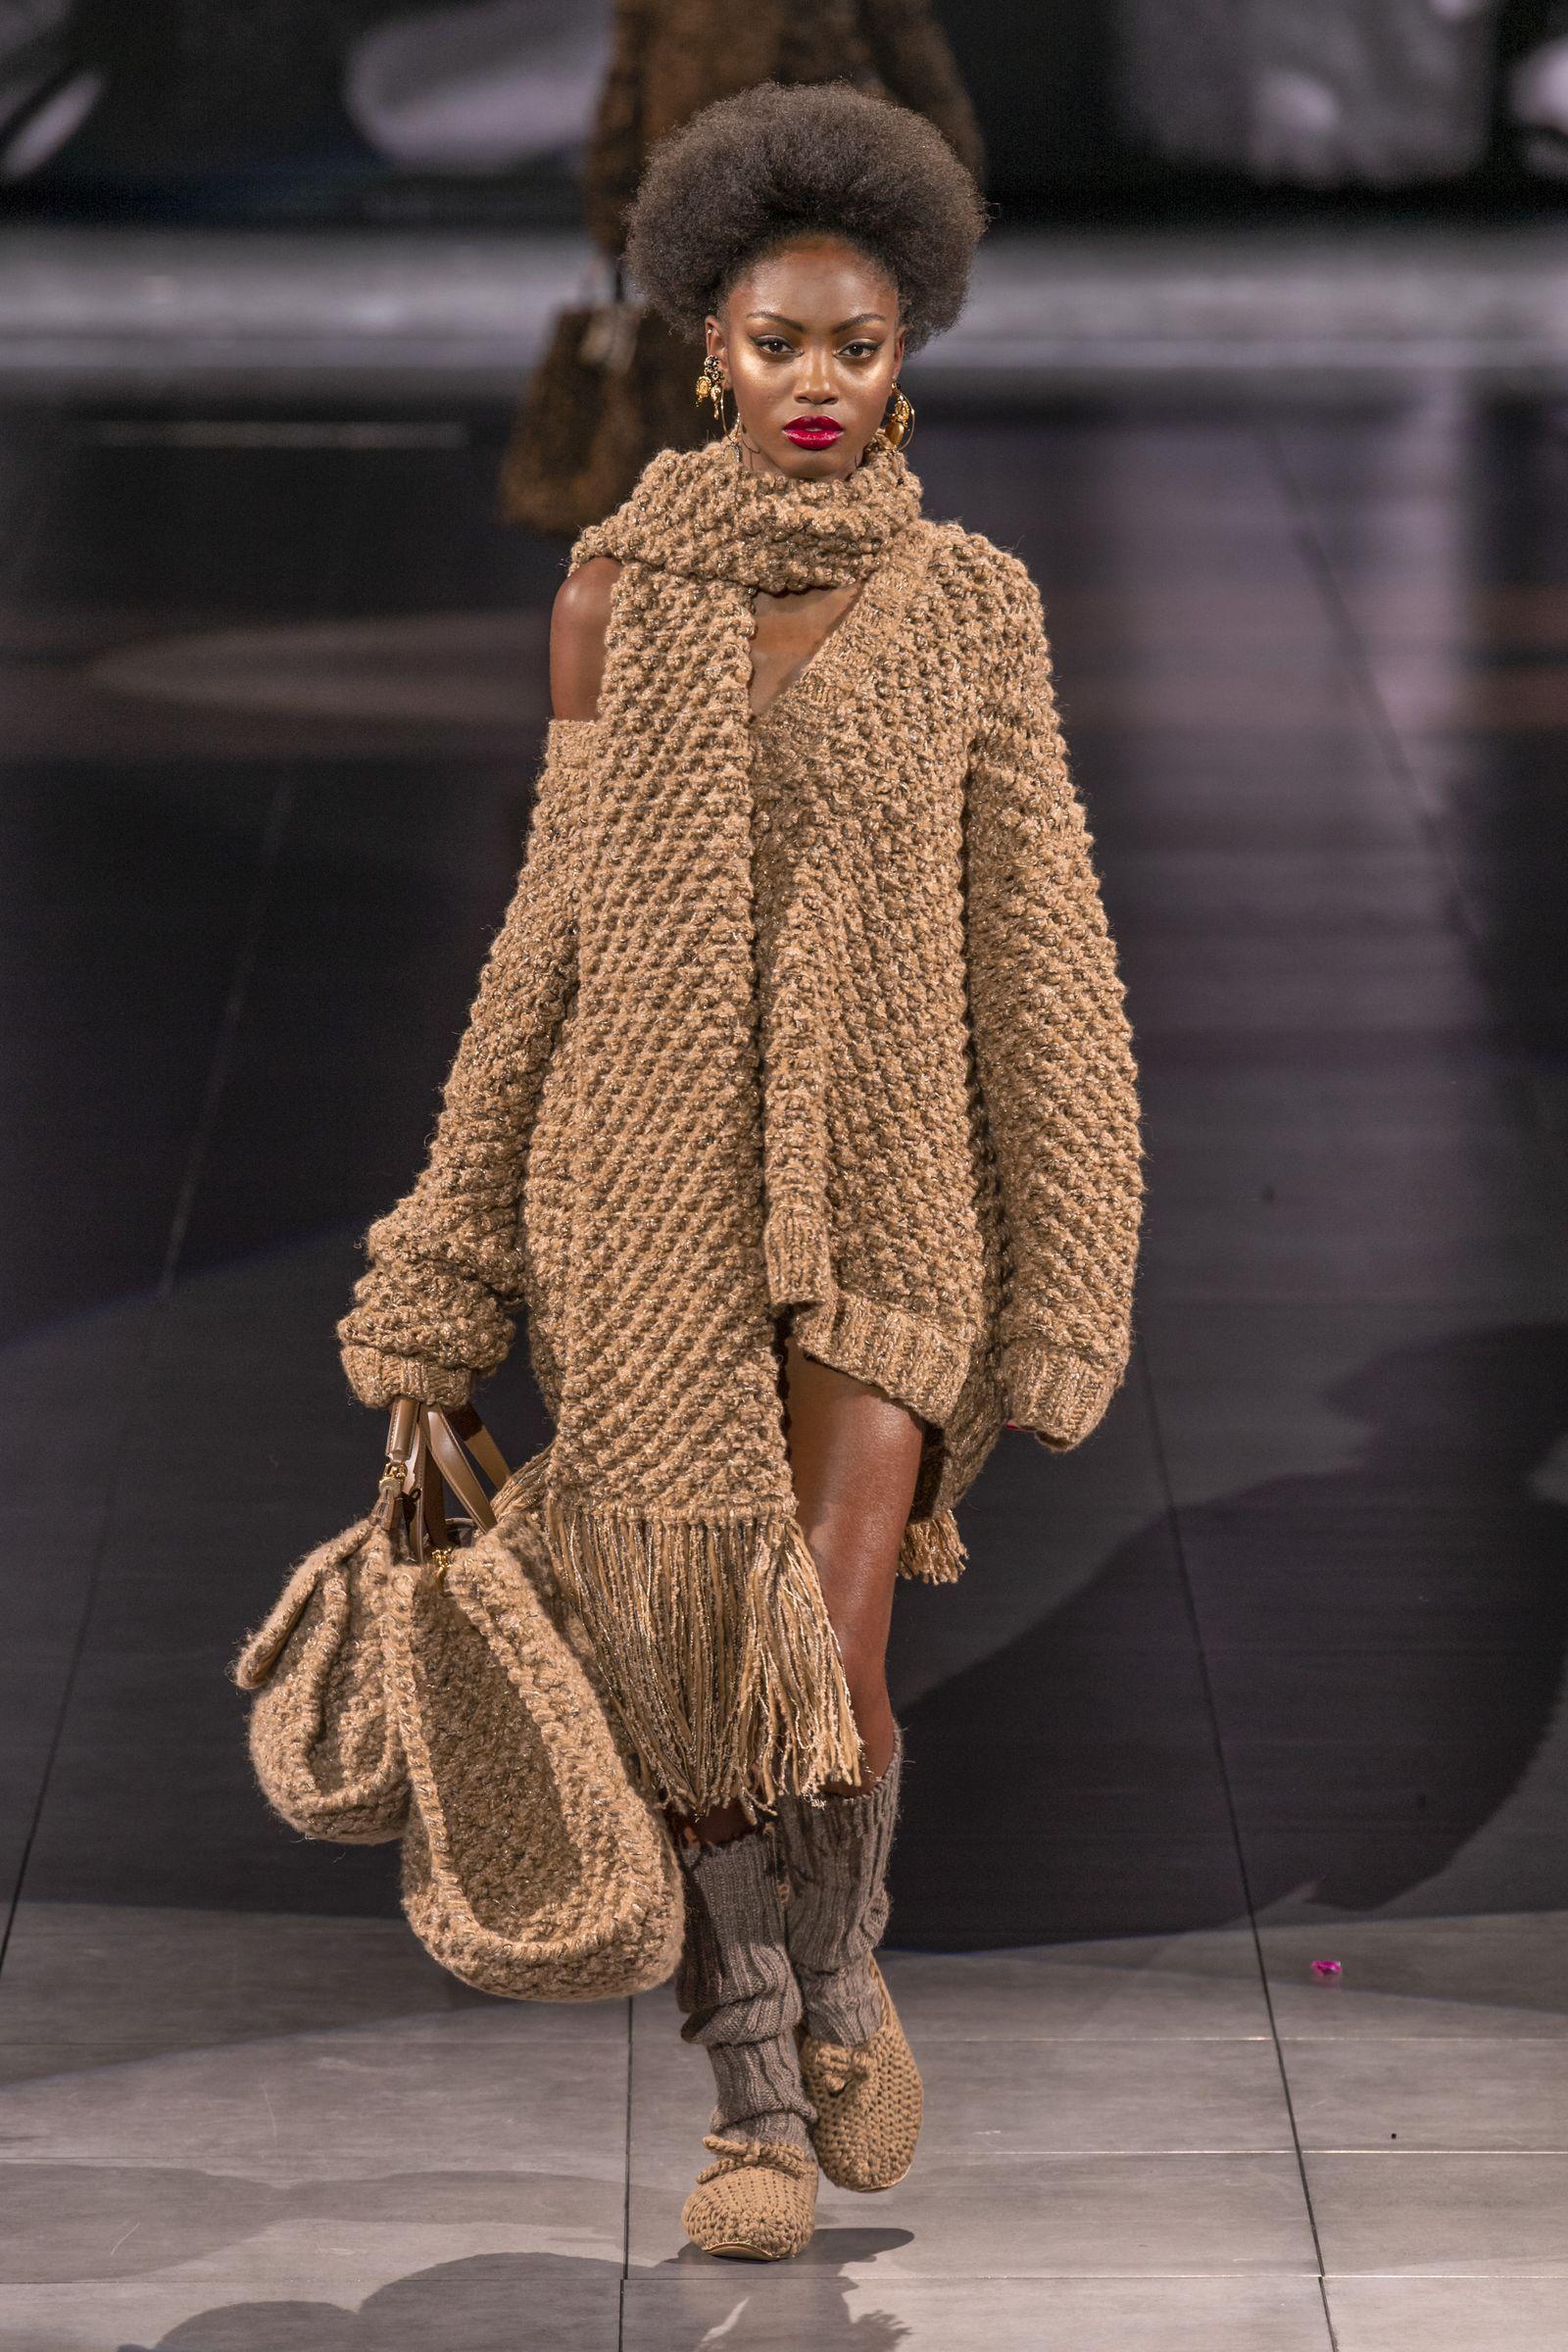 17+ Moda donna autunno inverno 2020 inspirations